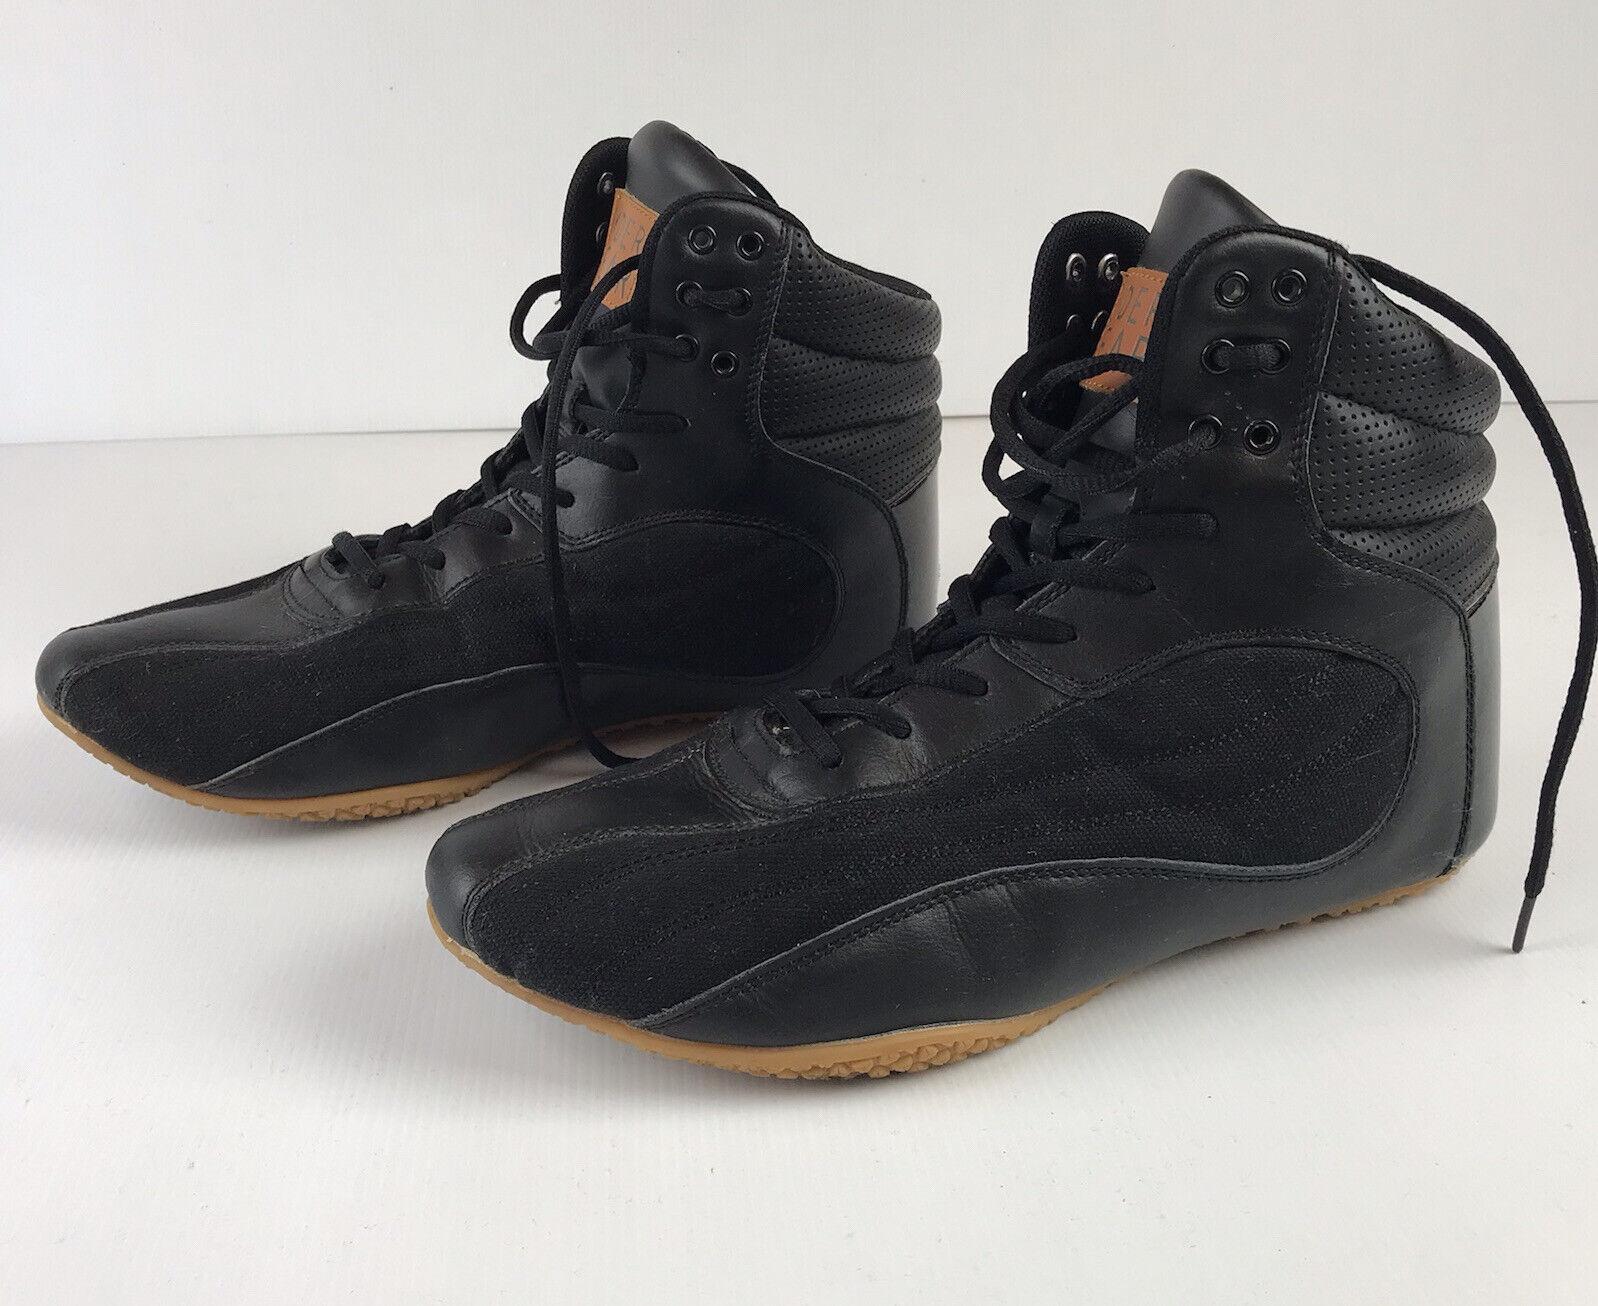 Ryder Wear Black Boots Size US 11